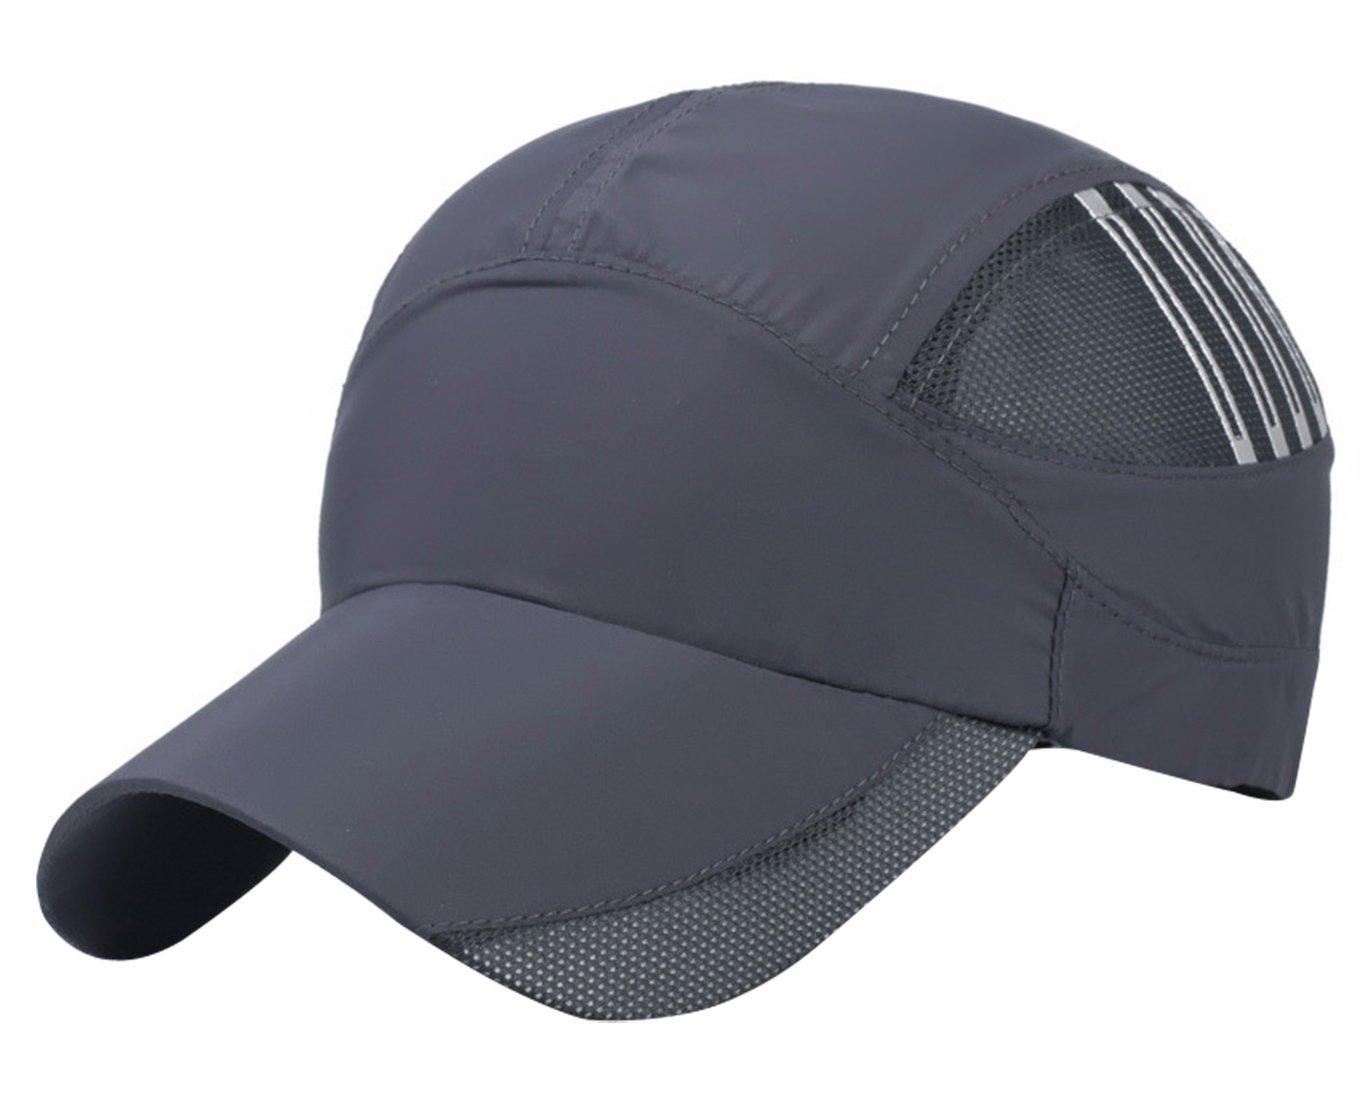 Unisex Summer Running Cap Quick Dry Mesh Outdoor Sun Hat Stripes Lightweight Breathable Soft Sports Cap